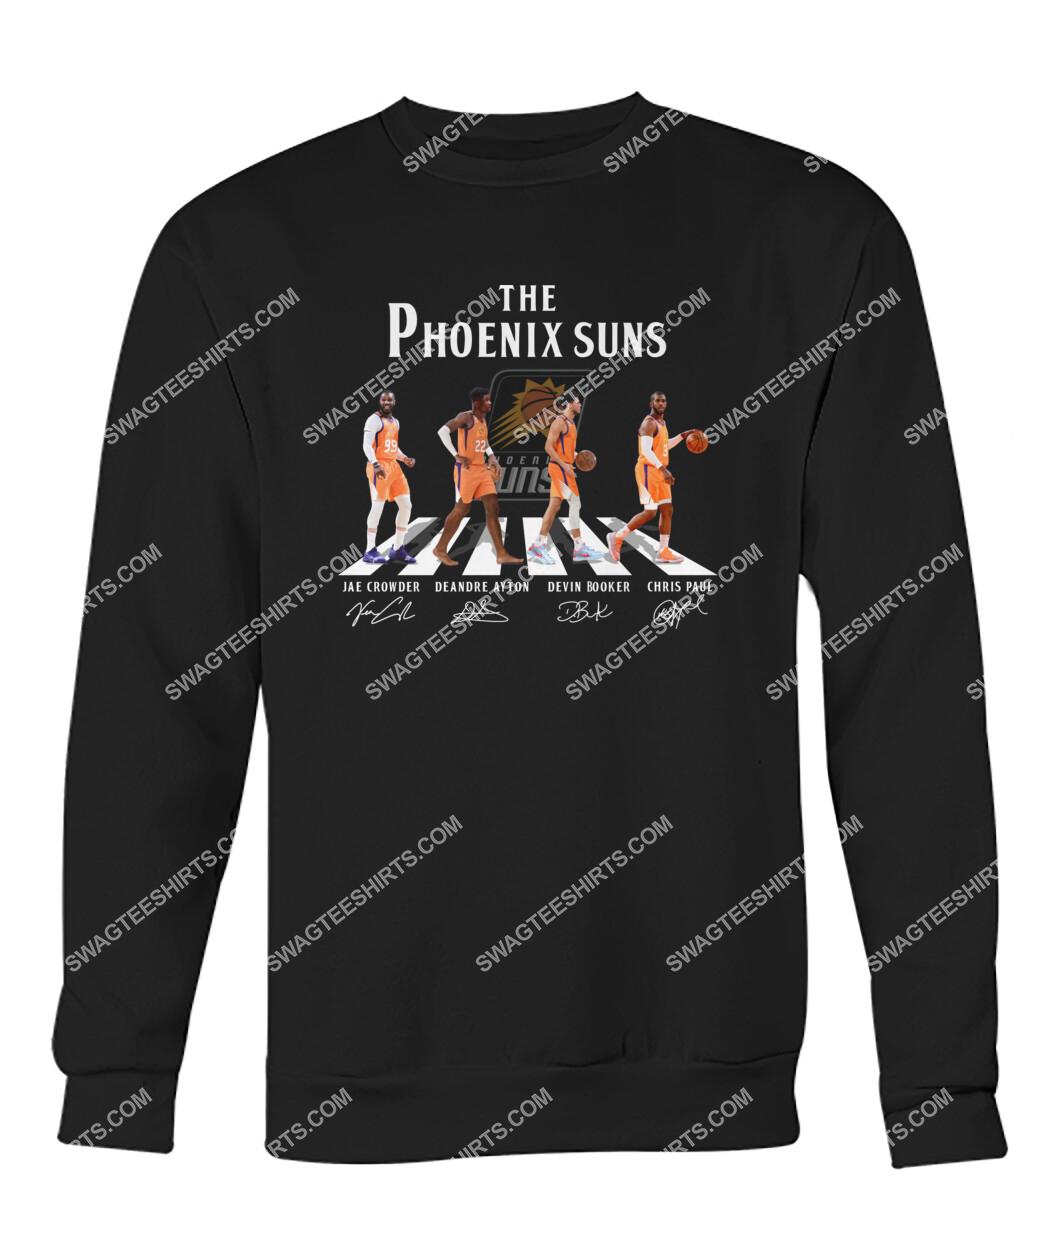 abbey road the phoenix suns signatures sweatshirt 1